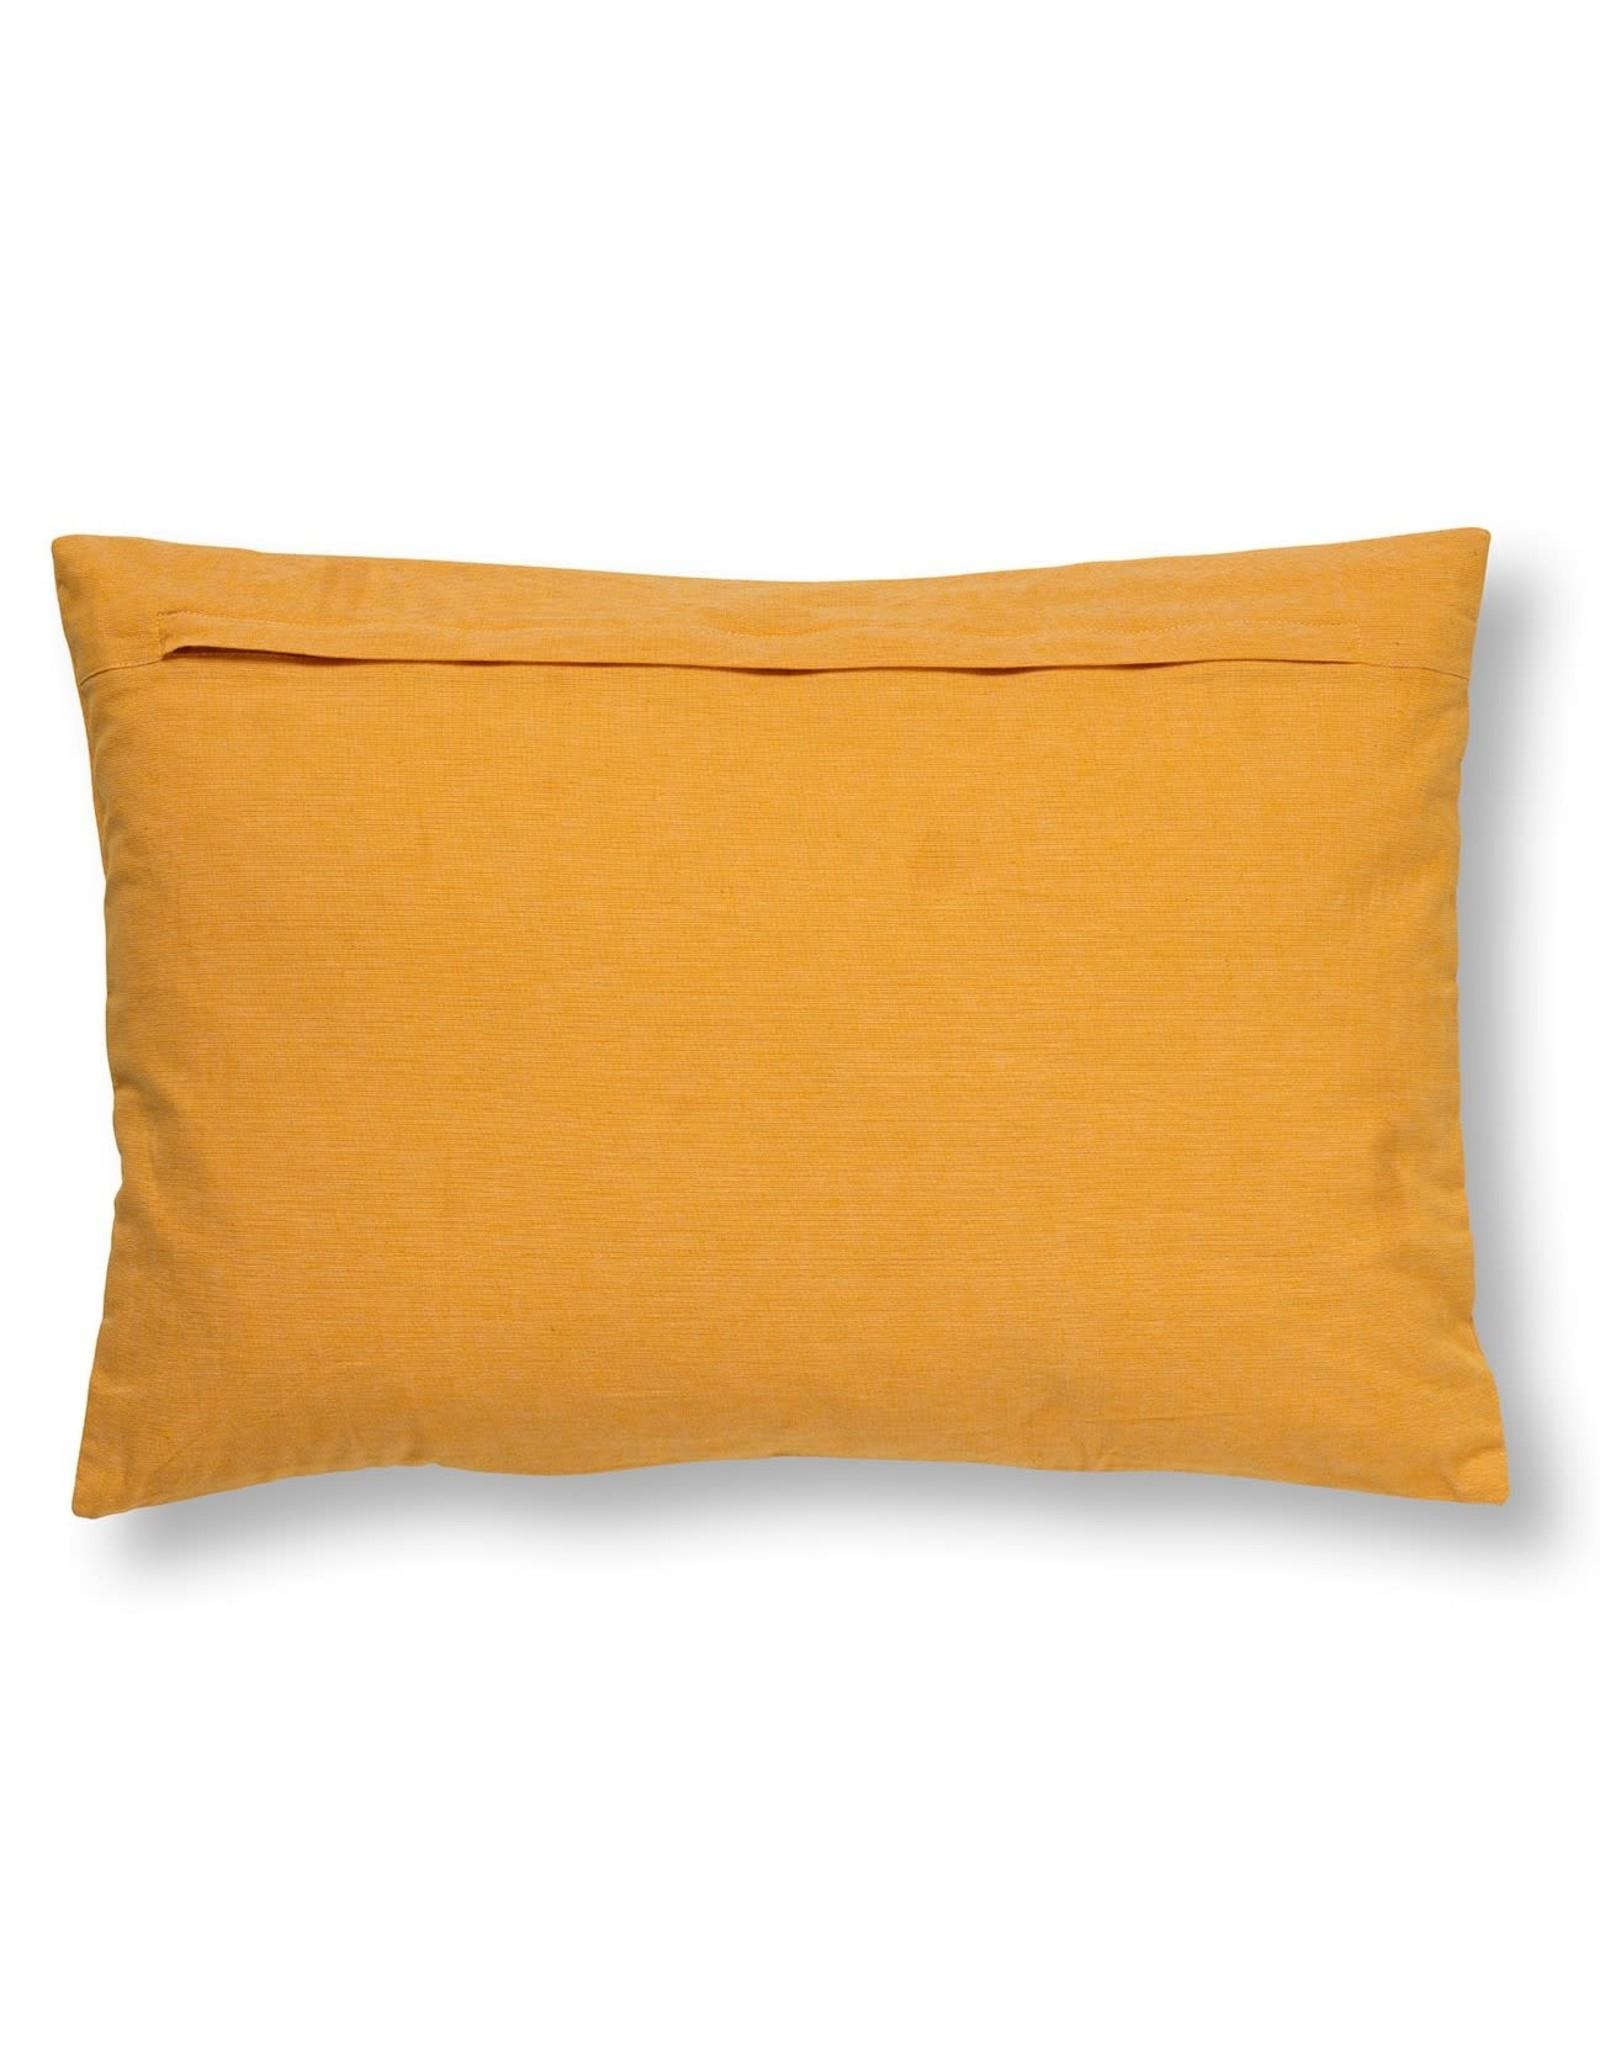 Dutch Decor Kussen - Madelin Golden Glow